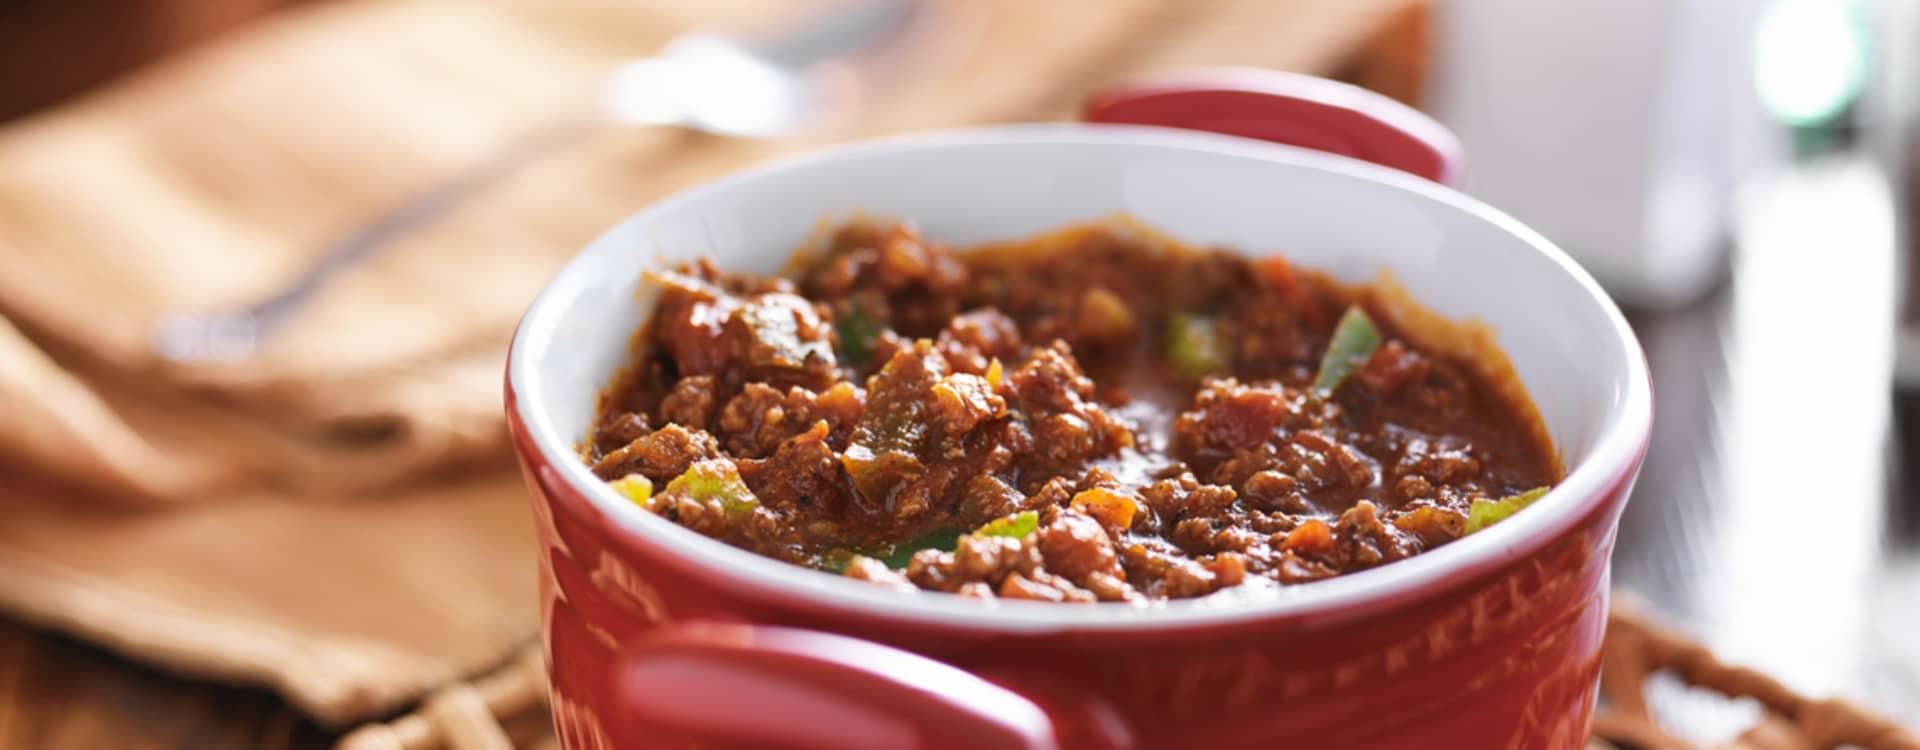 Chili con carne med jalepenos